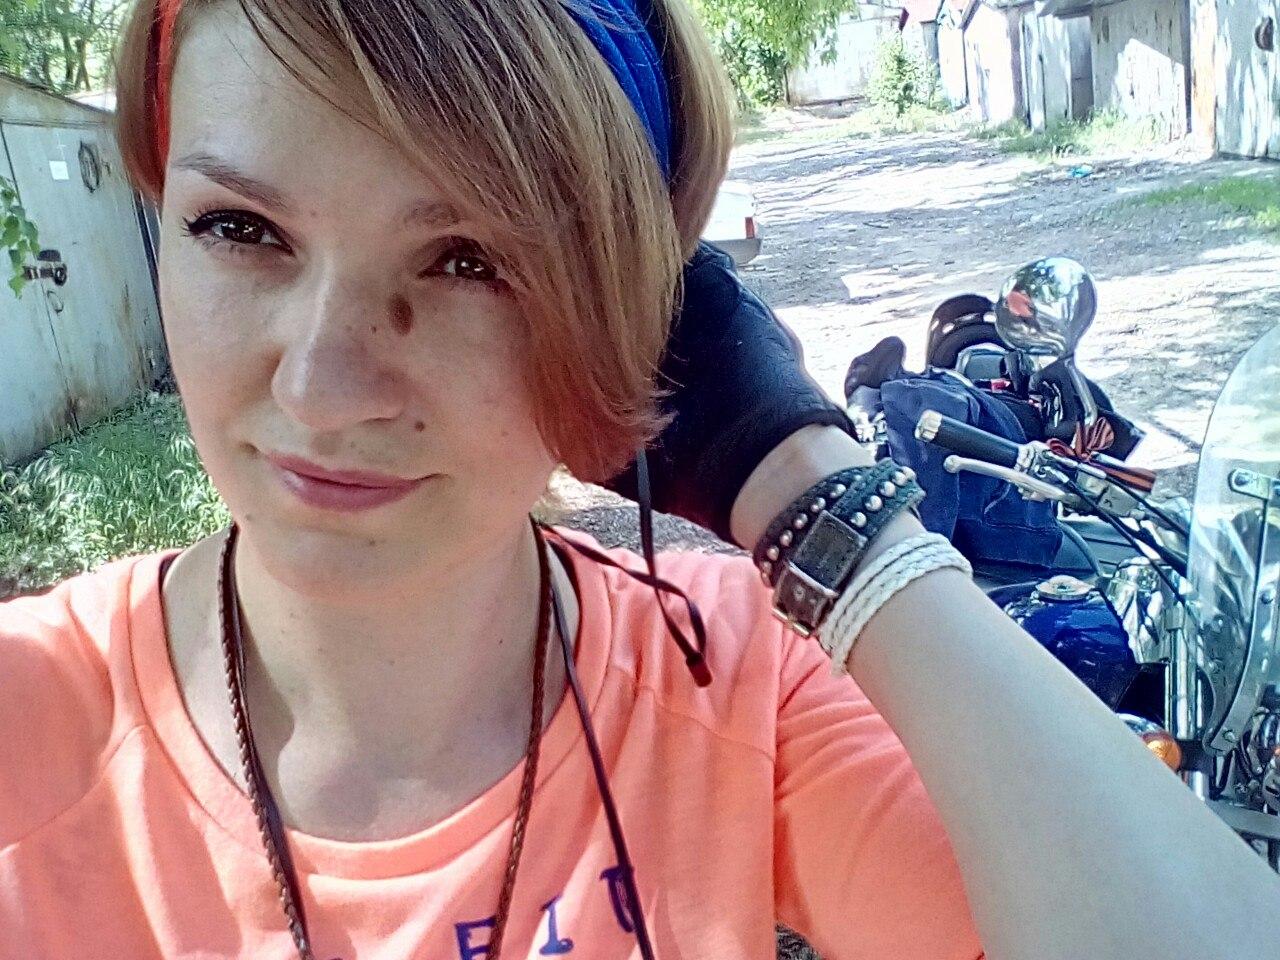 Наташа Артамонова Слитые Фото